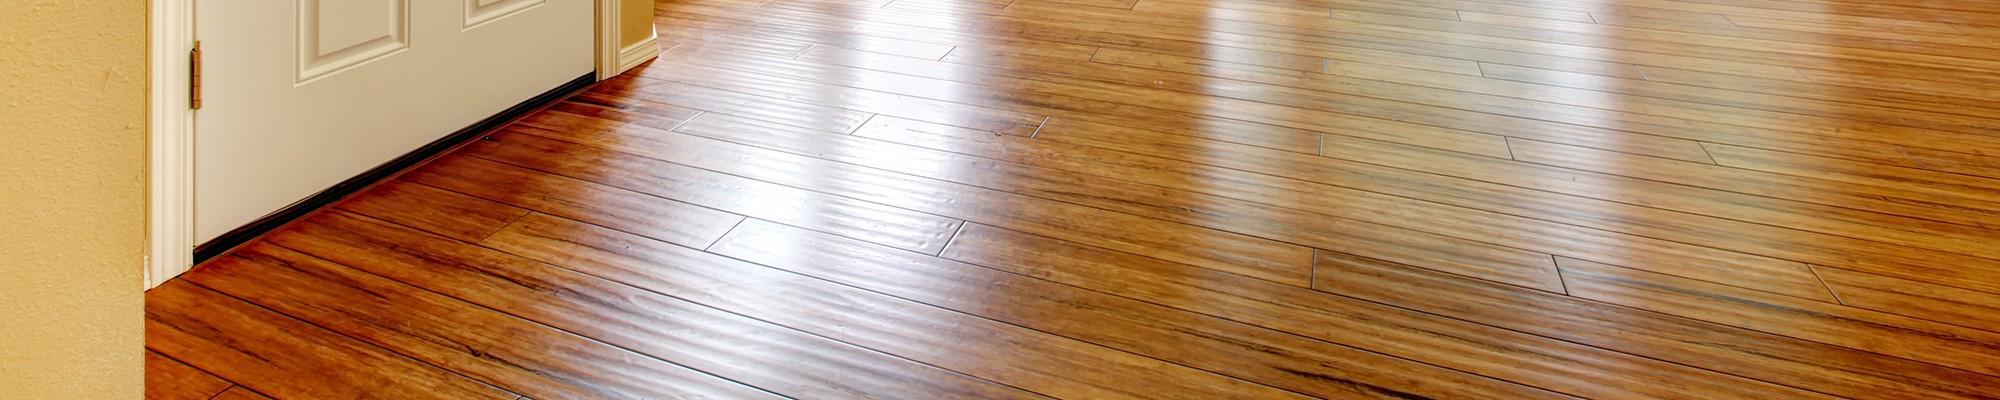 hardwood flooring duluth mn of hardwood floor refinishing hardwood floor staining duluth mn with regard to 121214361